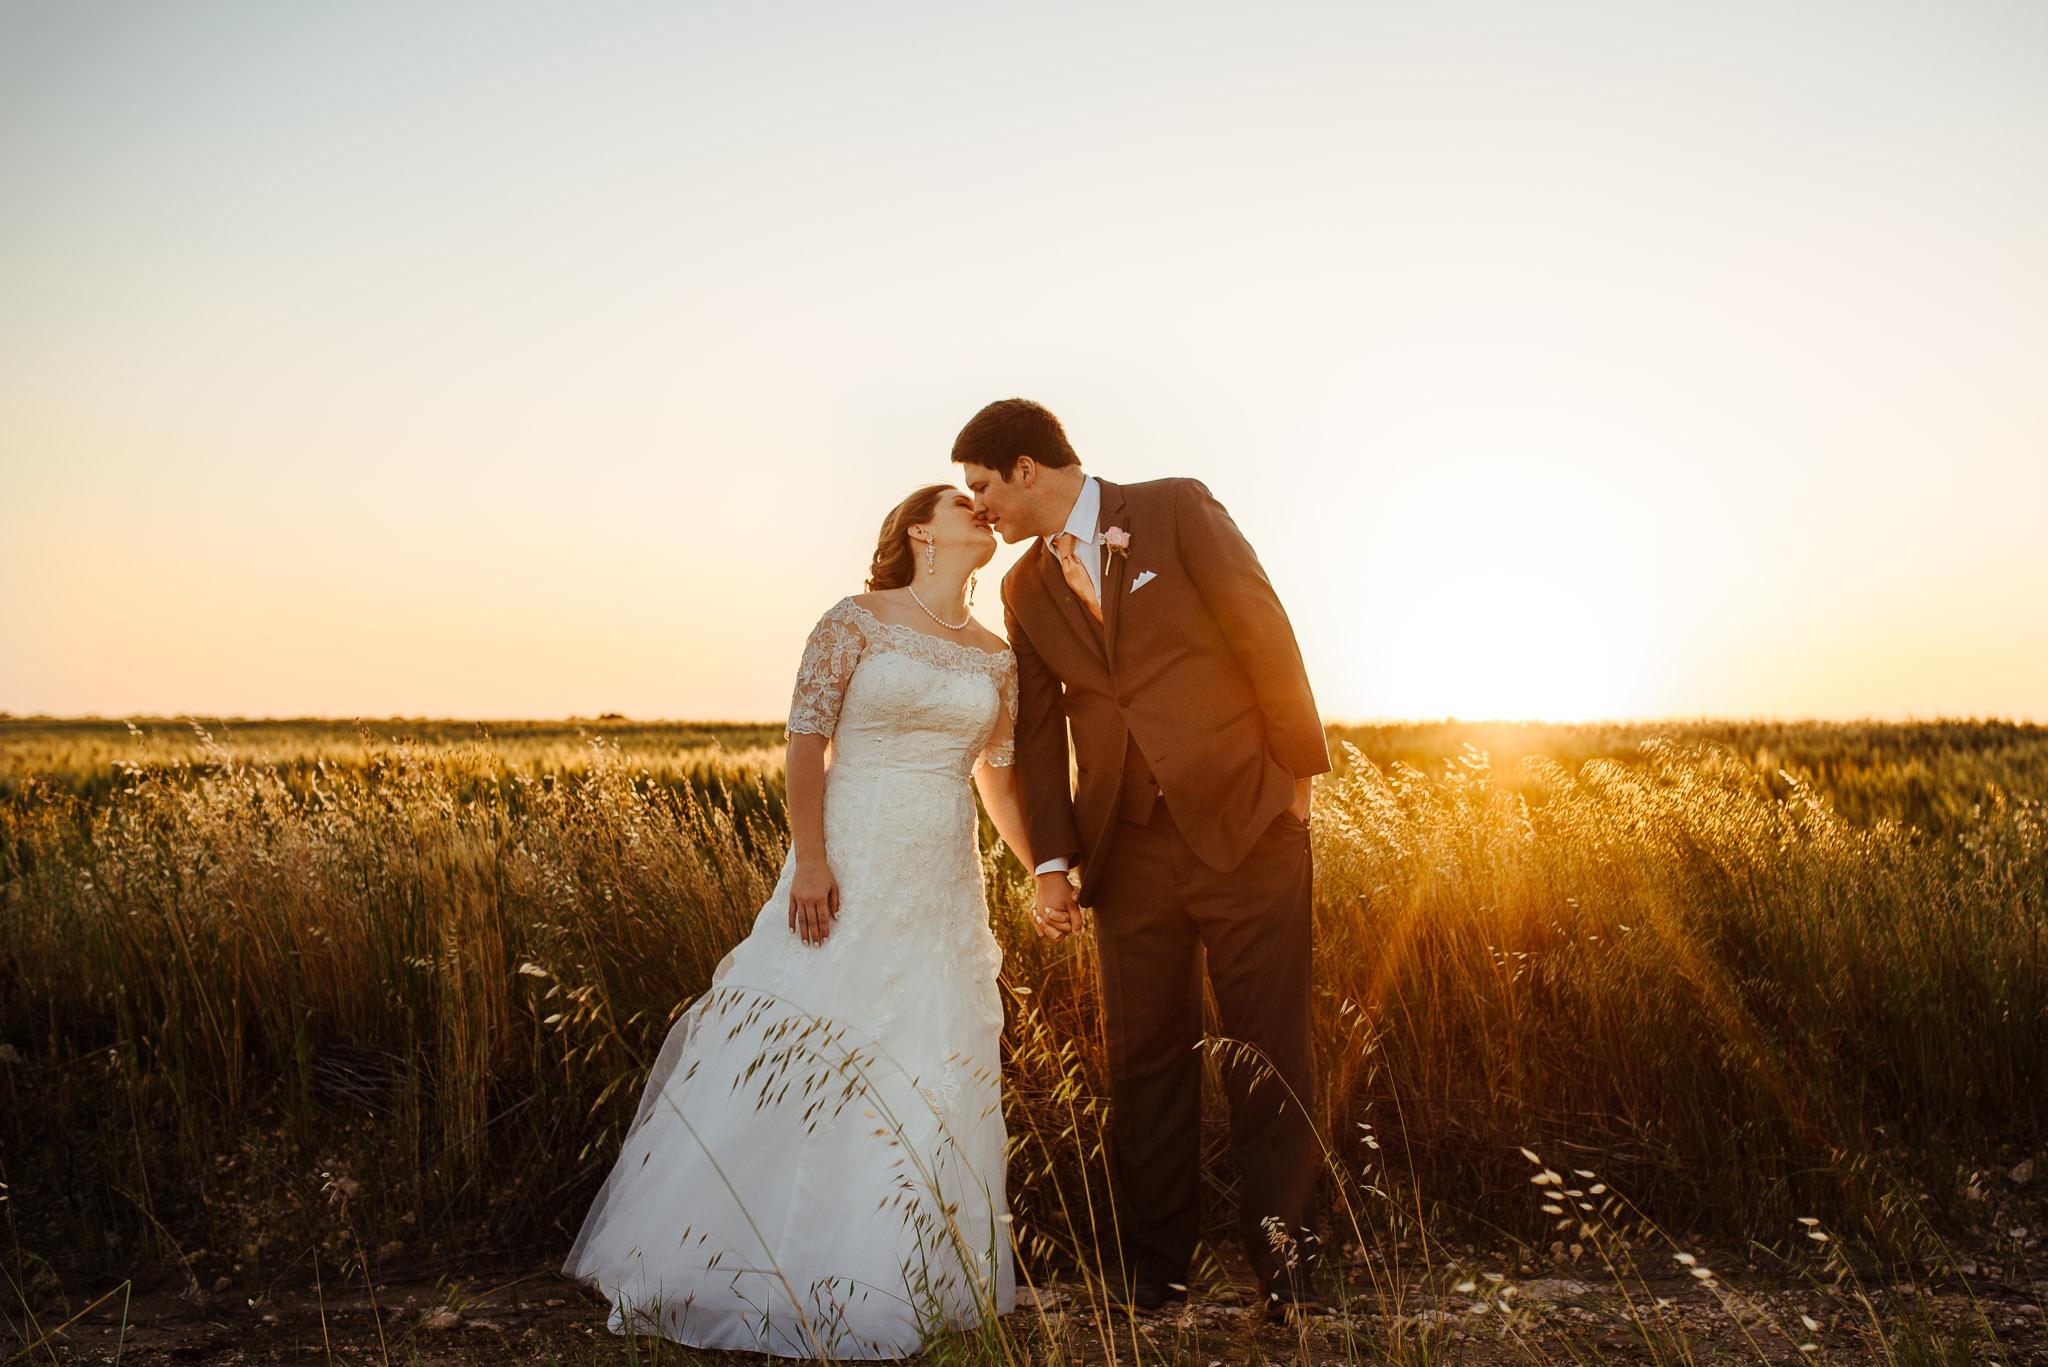 West-Texas-Wedding-Photographer-0025.jpg